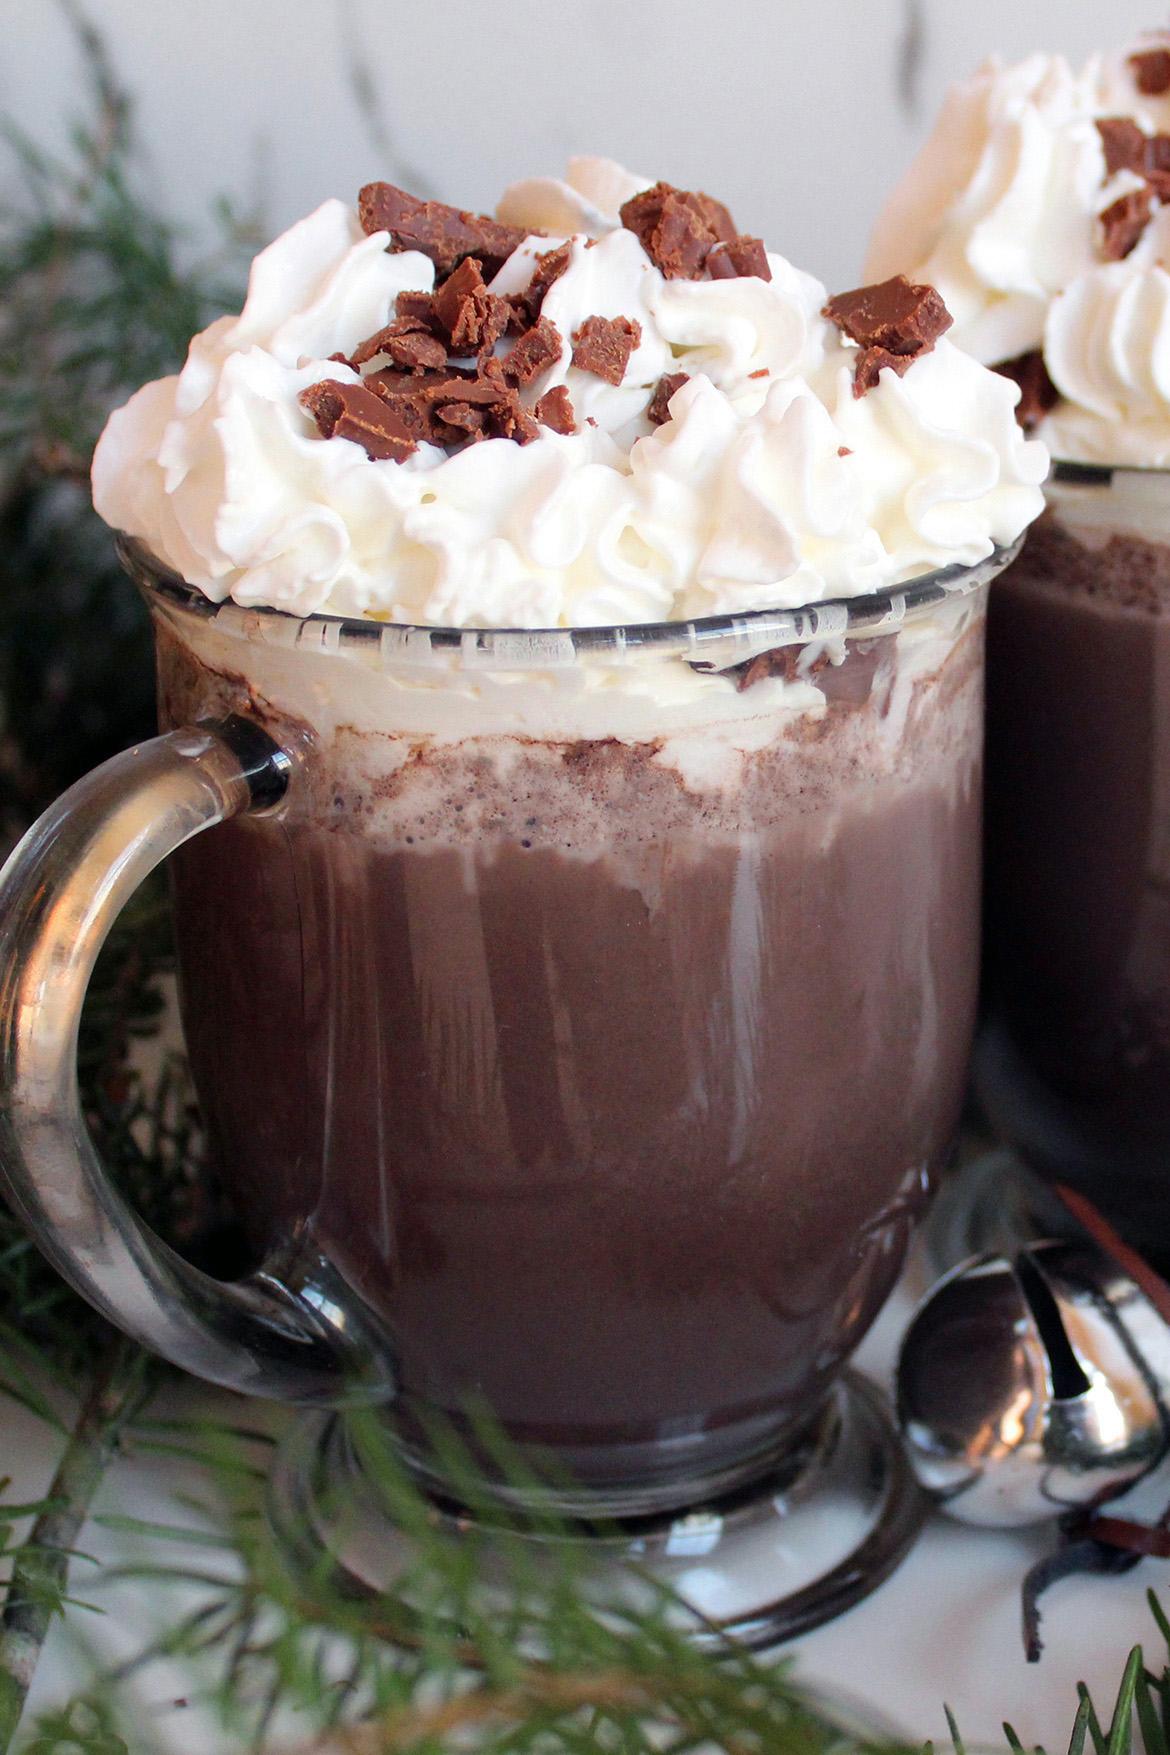 Healthy and Simple Vegan Hot Chocolate Recipe